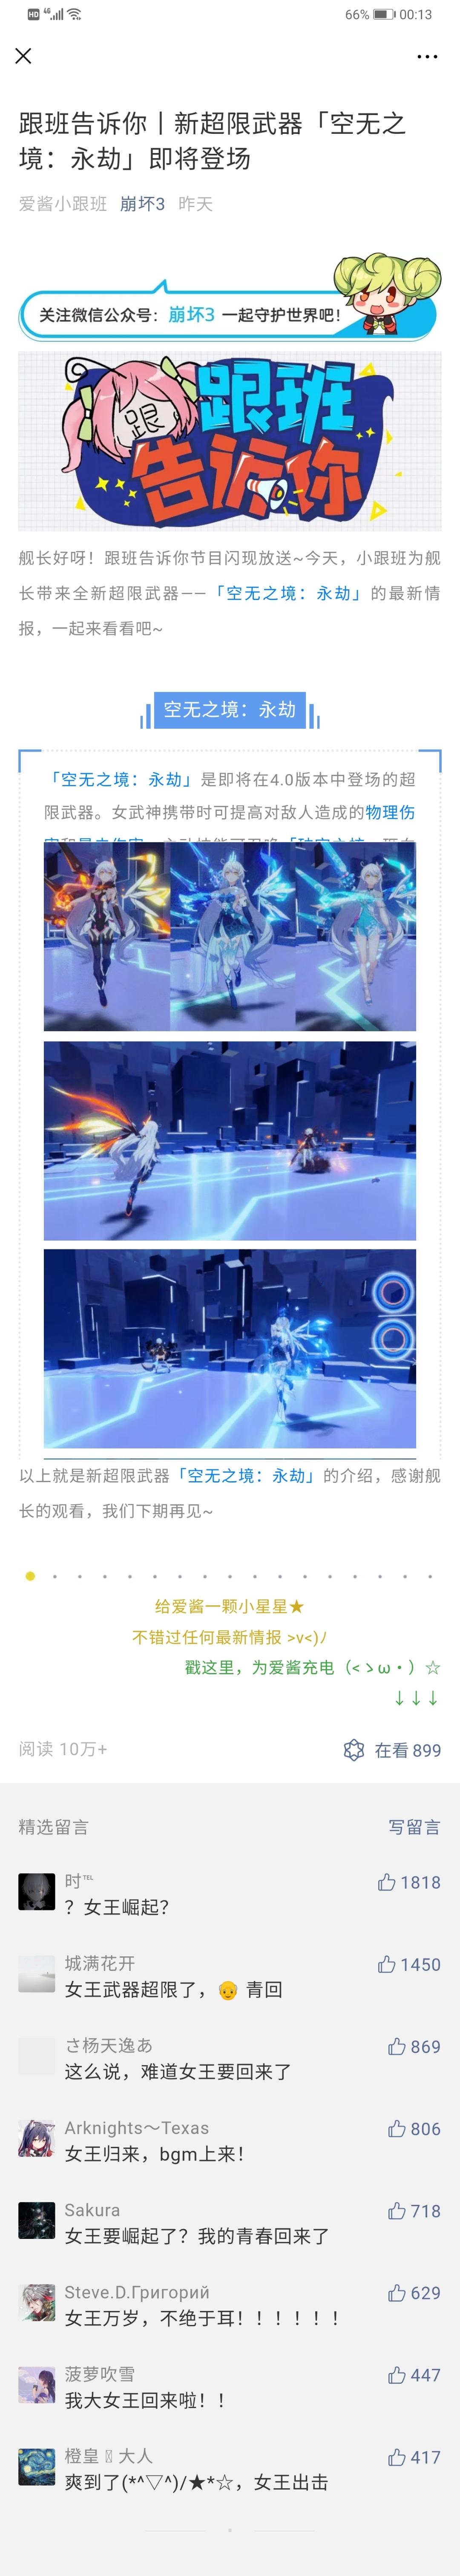 Screenshot_20200509_001337_com.tencent.mm.jpg